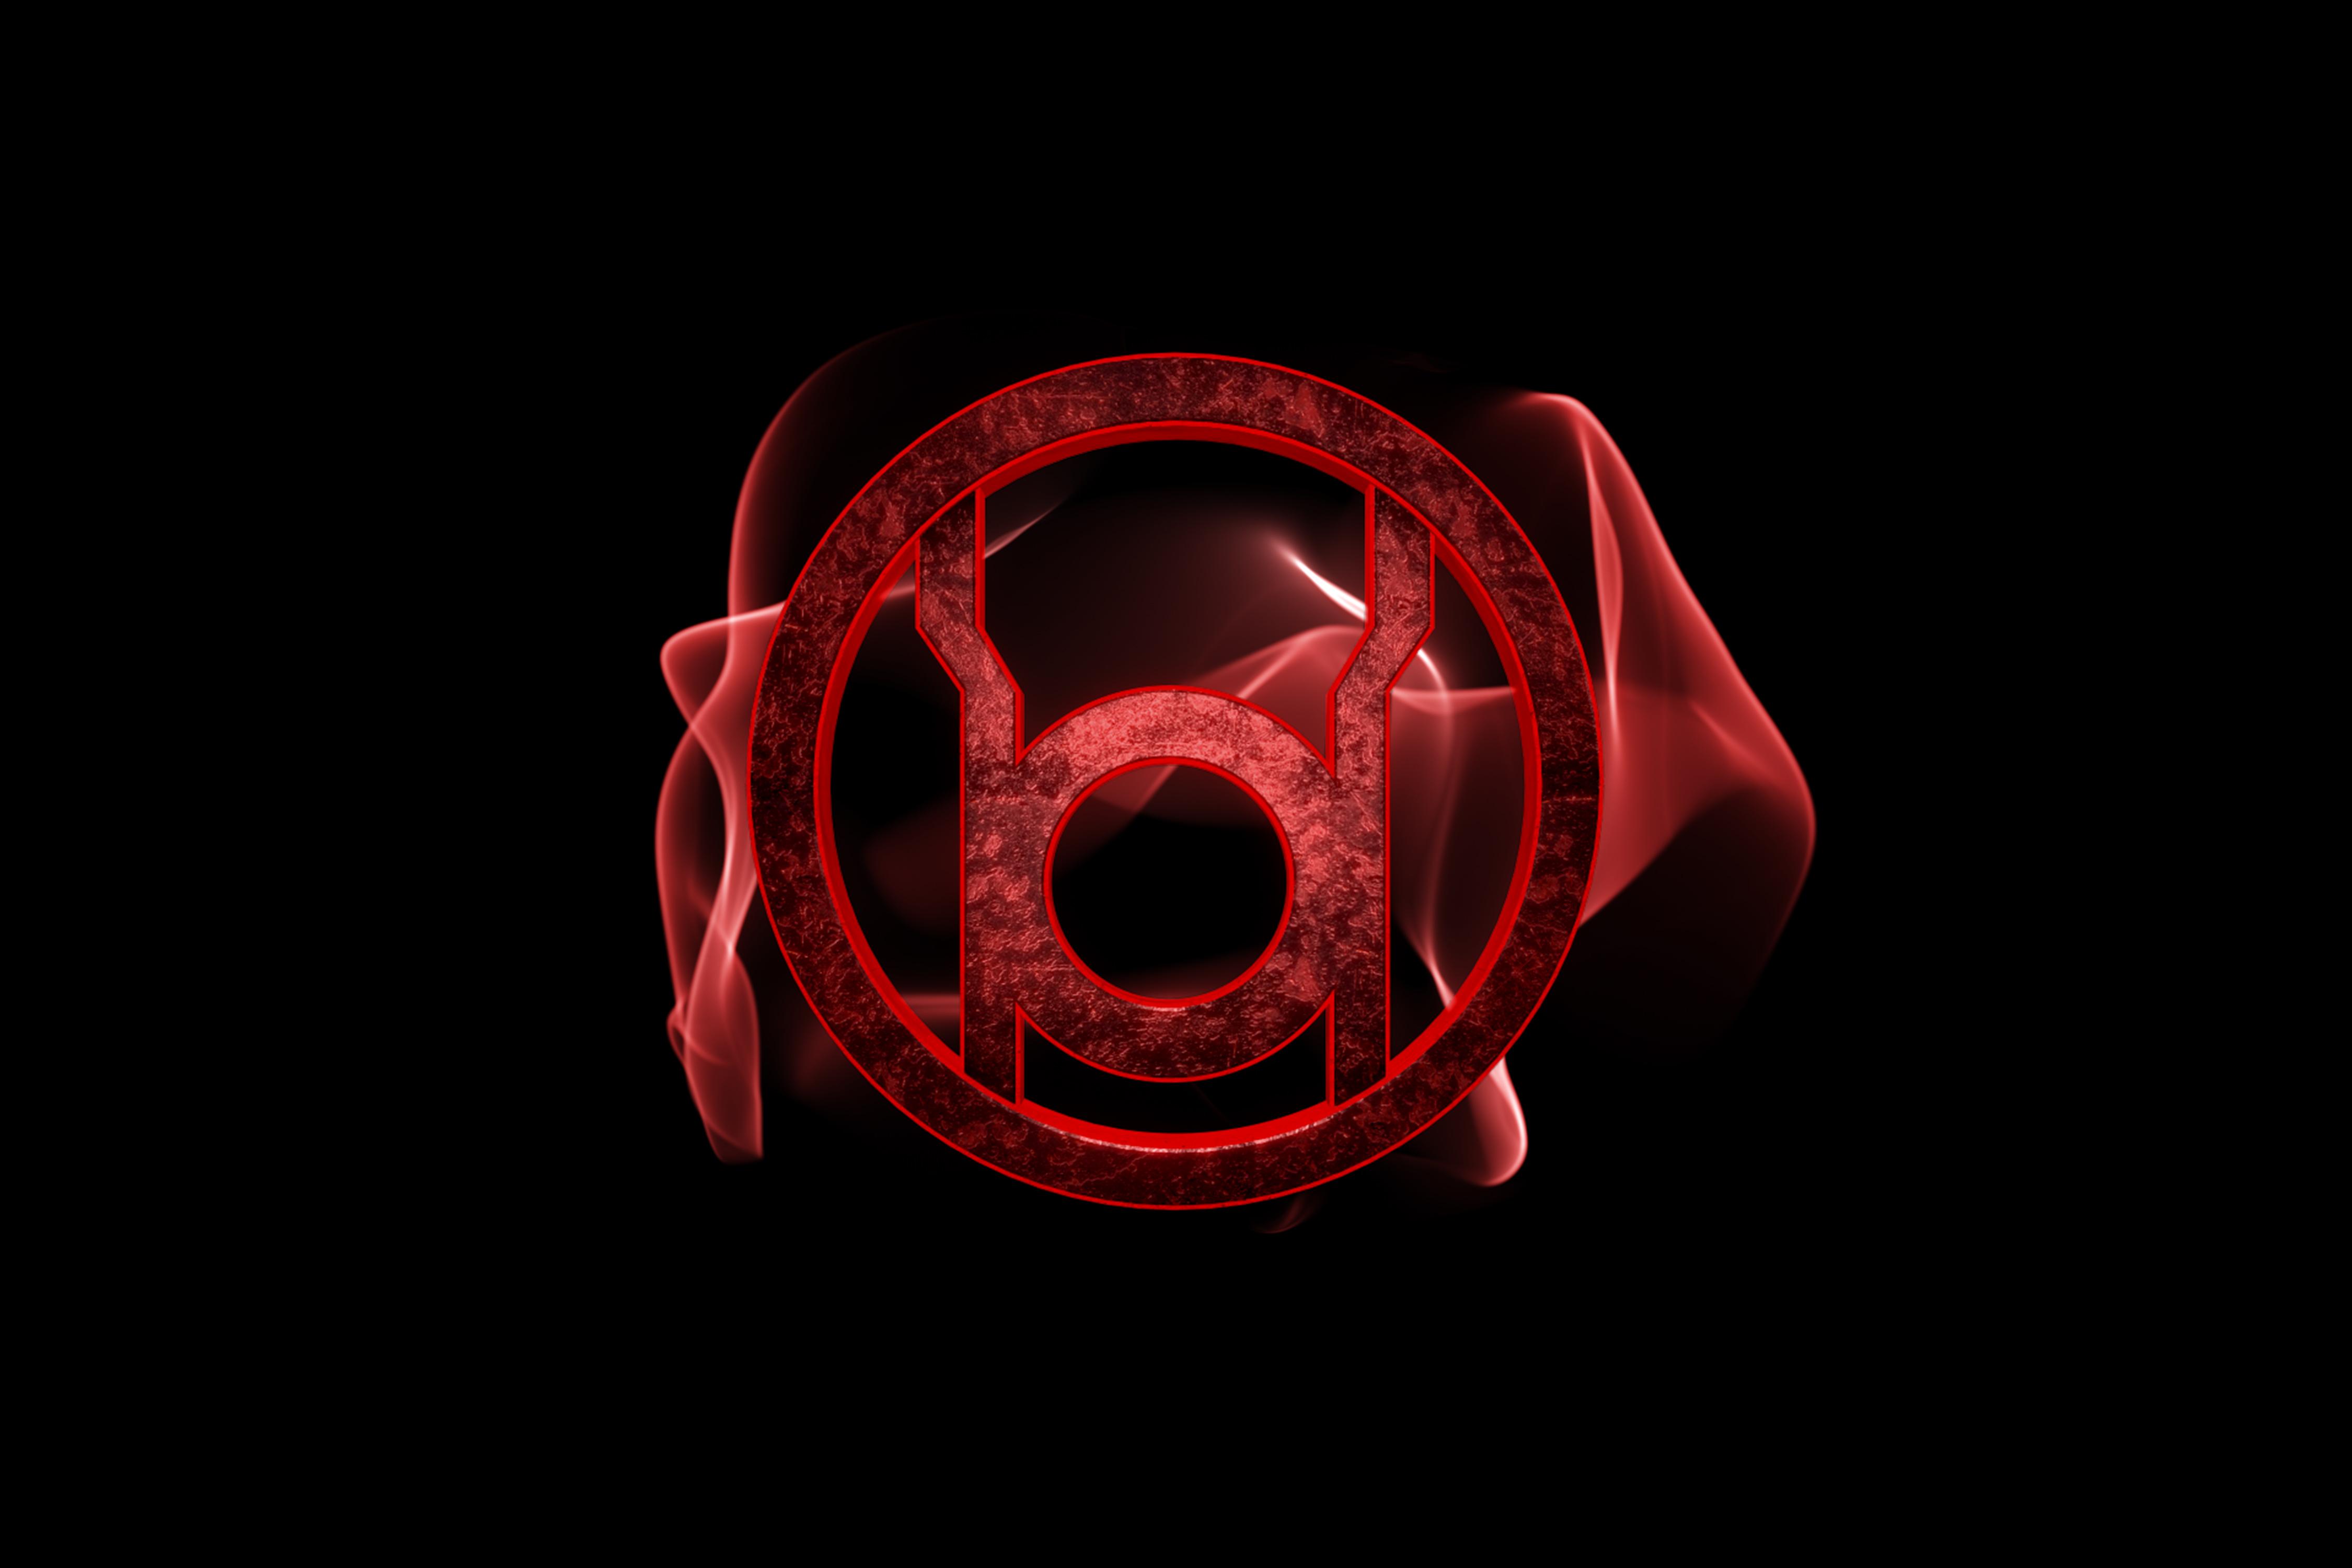 Red Lantern Glow 4500x3000